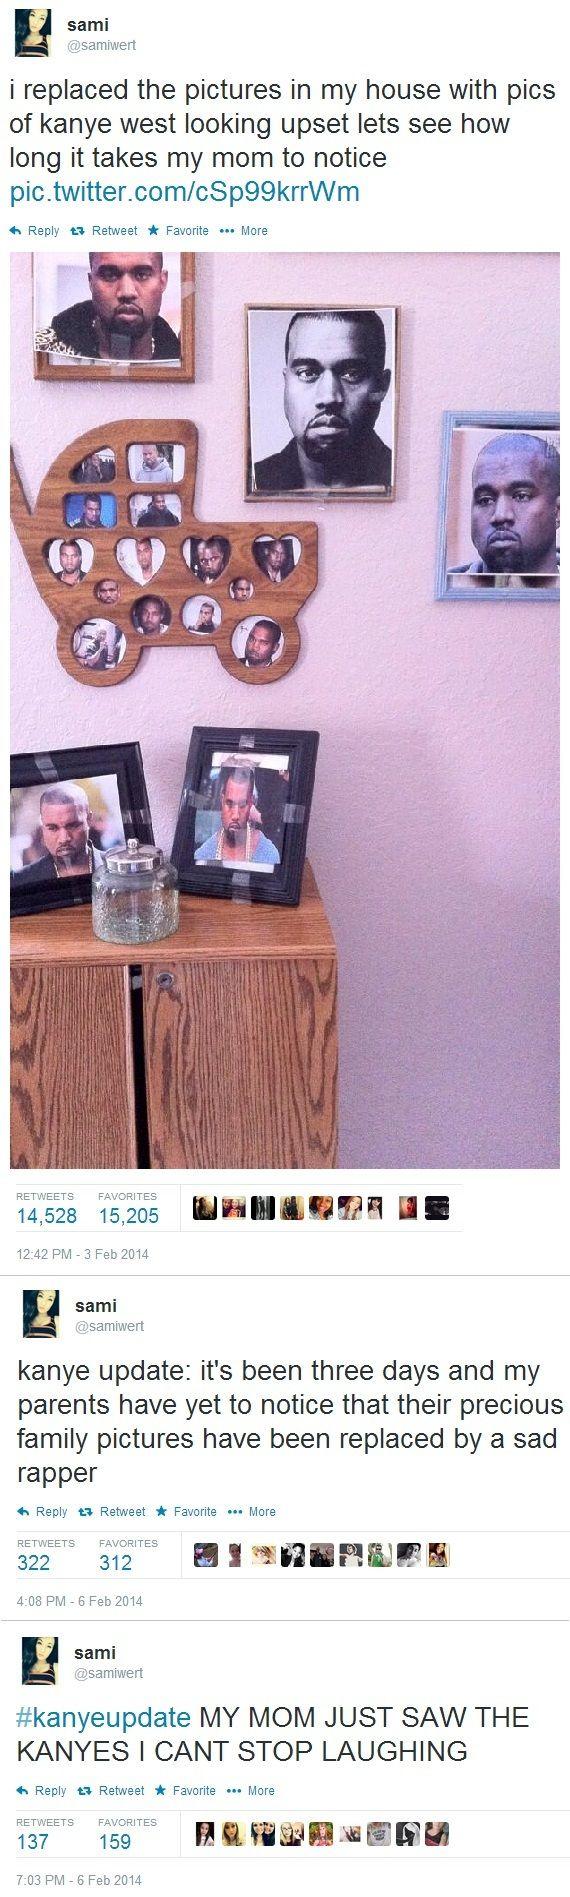 15 Hilariously Evil Prank Ideas - Bathroom Prank | Guff